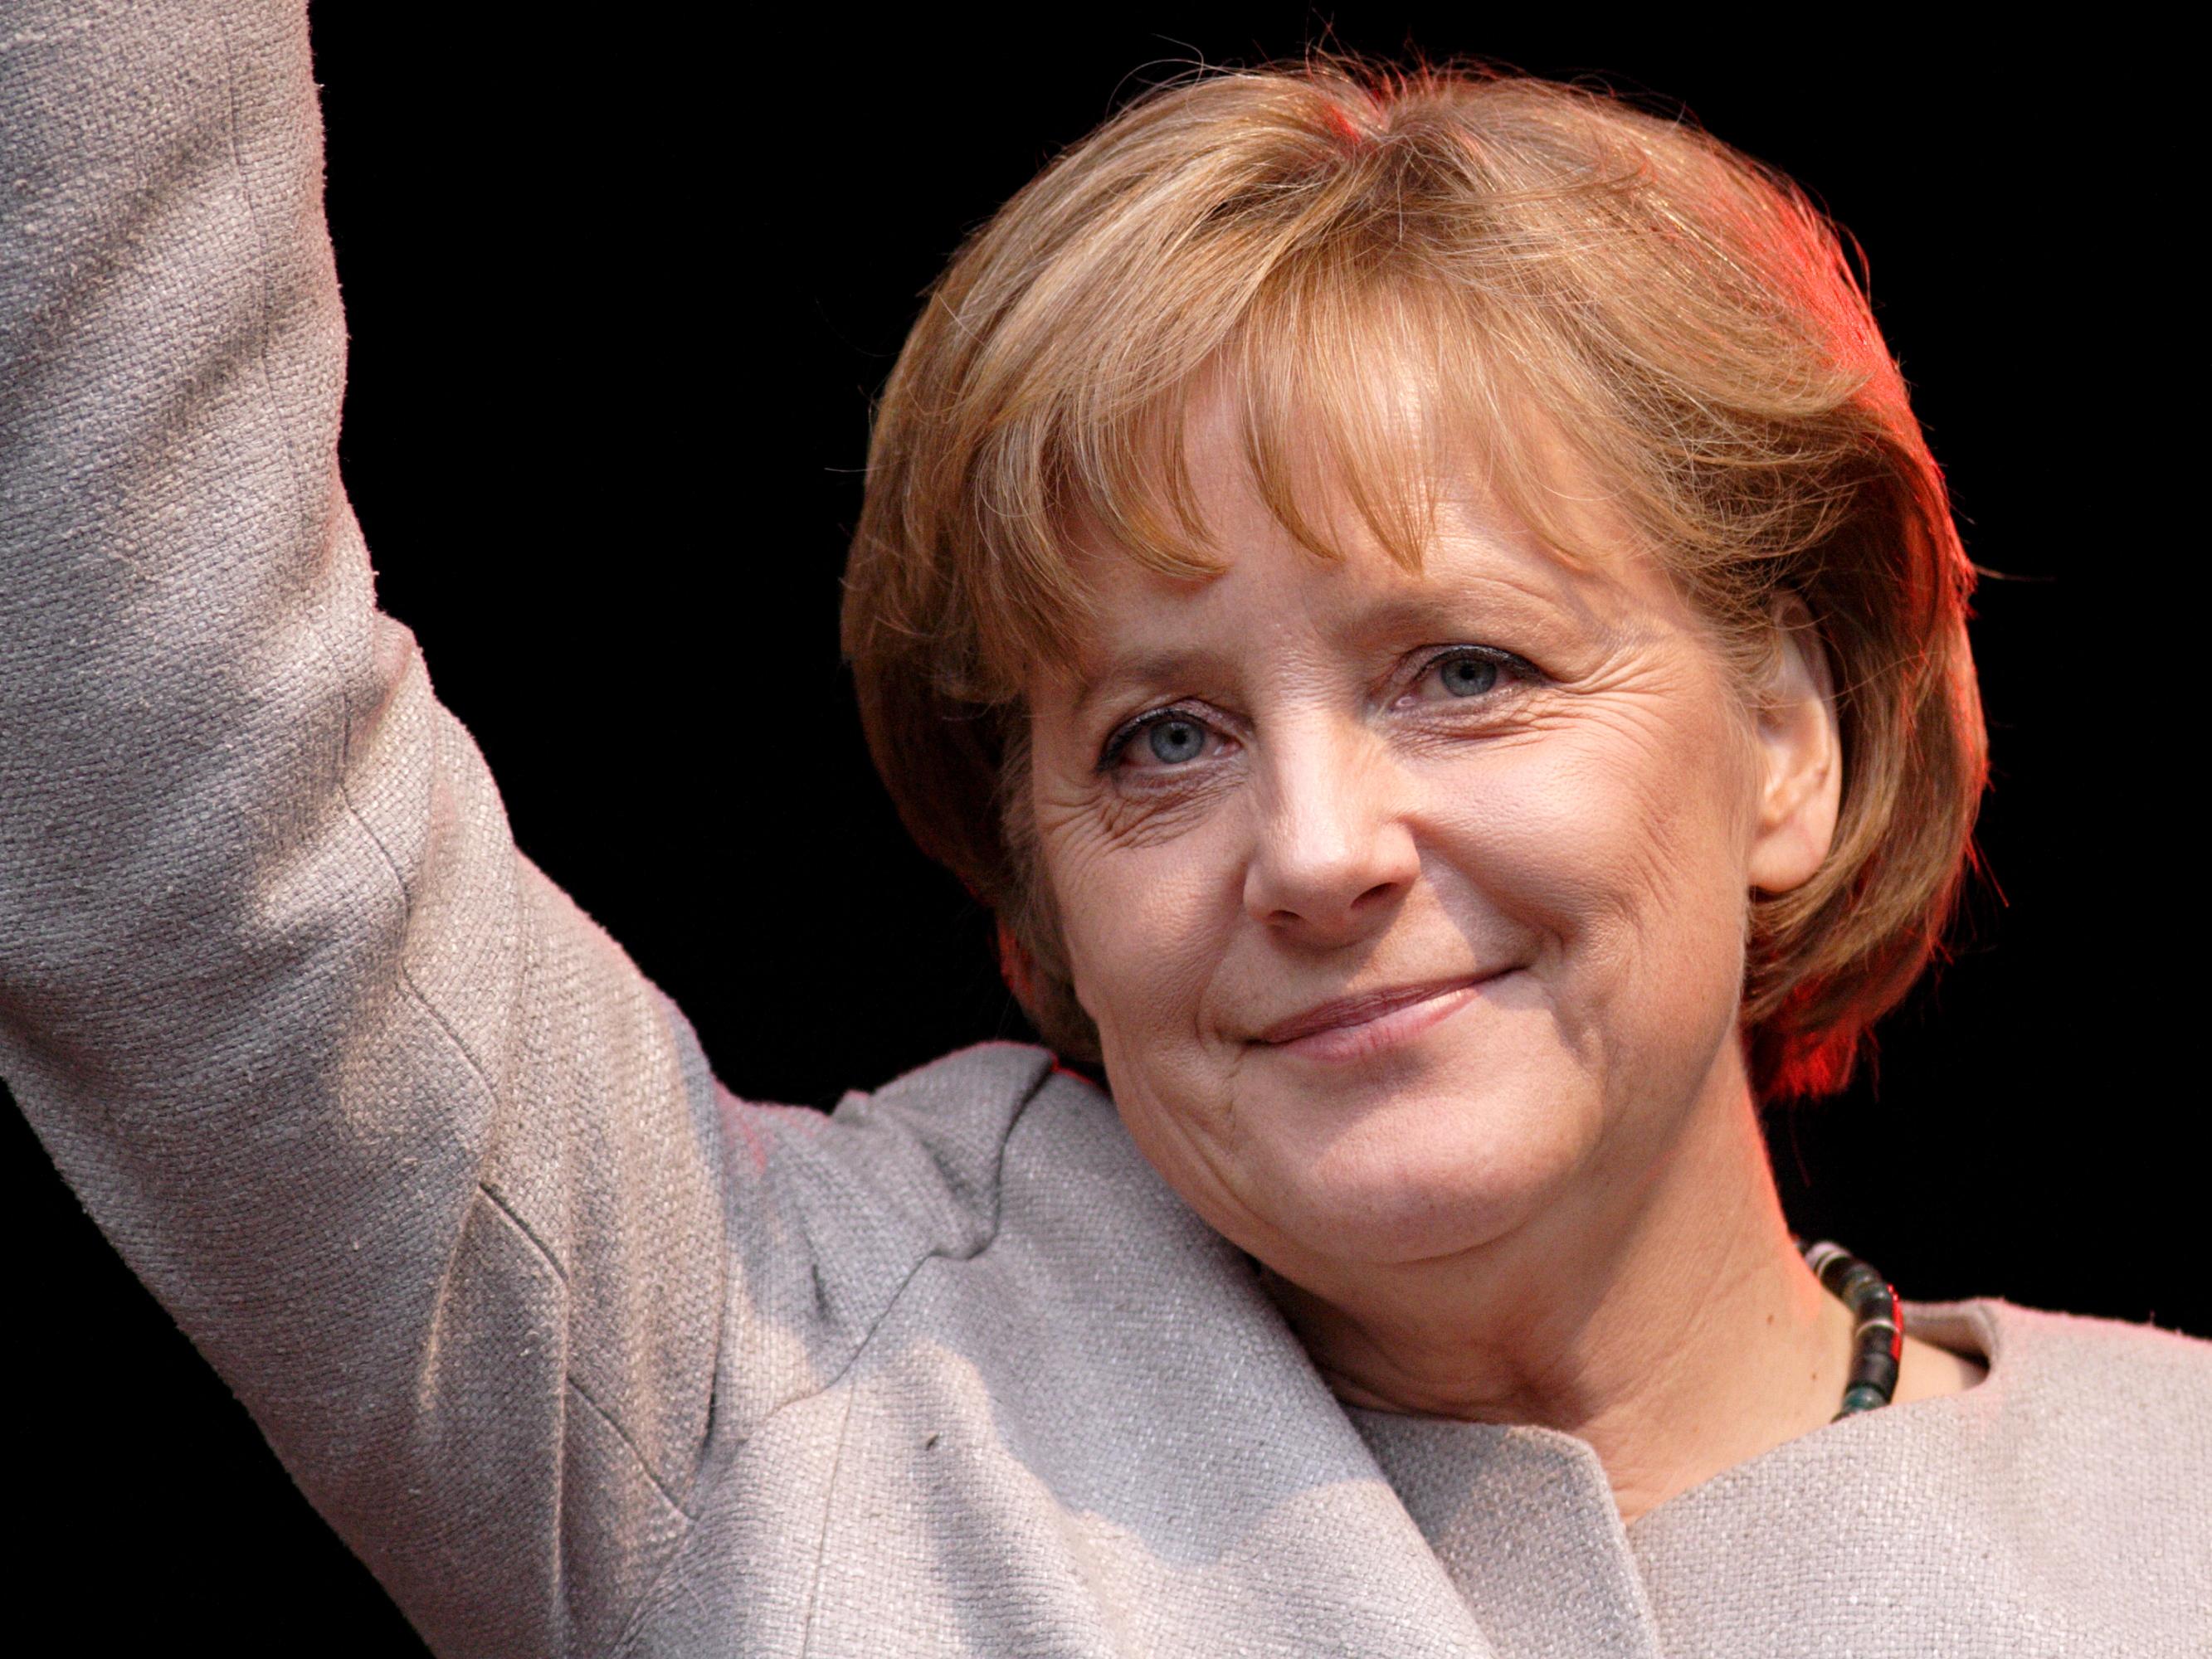 Angela Merkel S Values The Standard